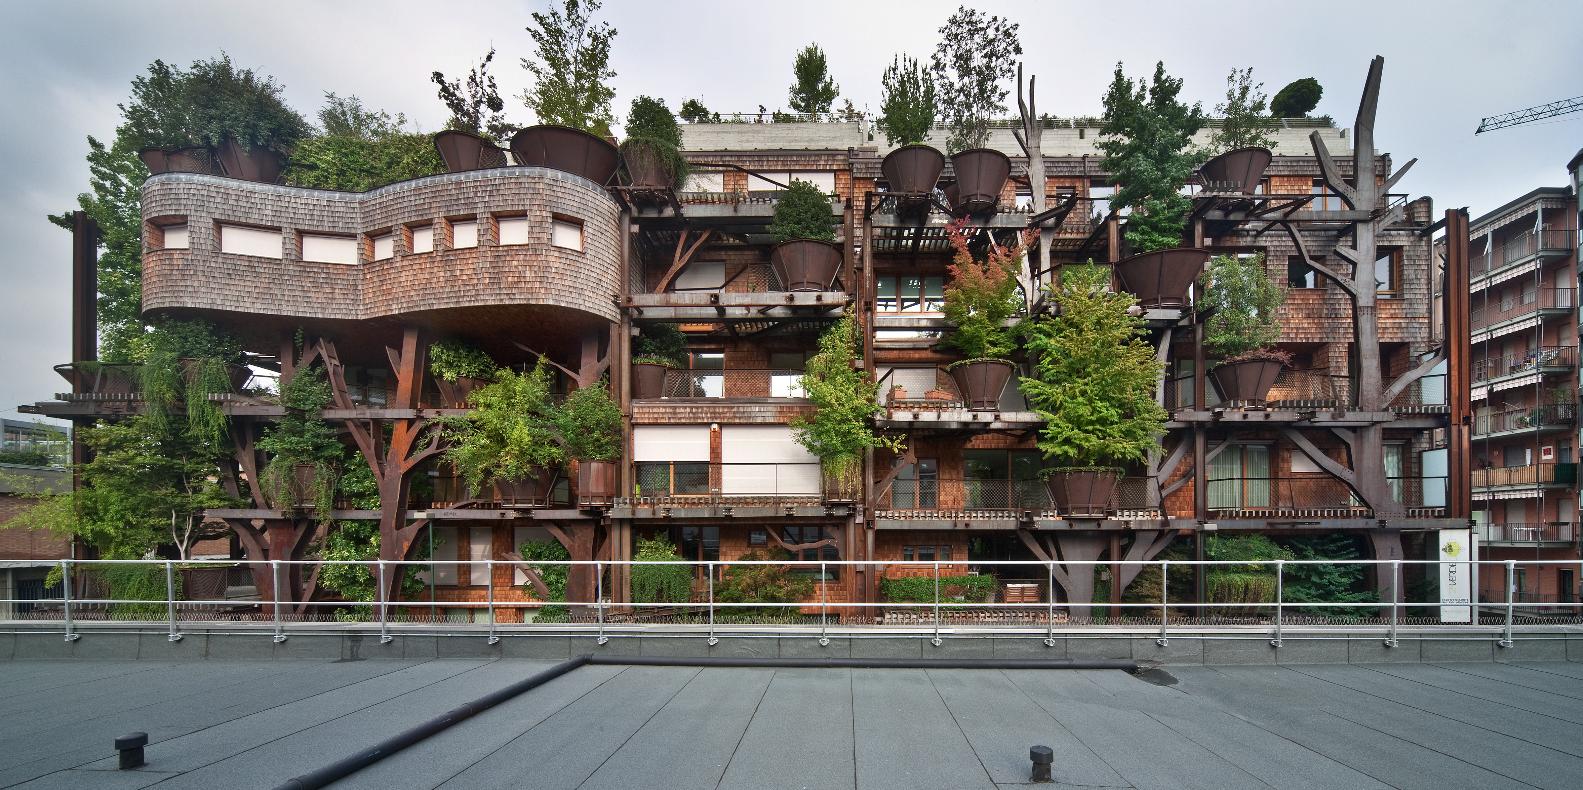 Residenze 25 Green a Torino (Photo by Beppe Giardino)